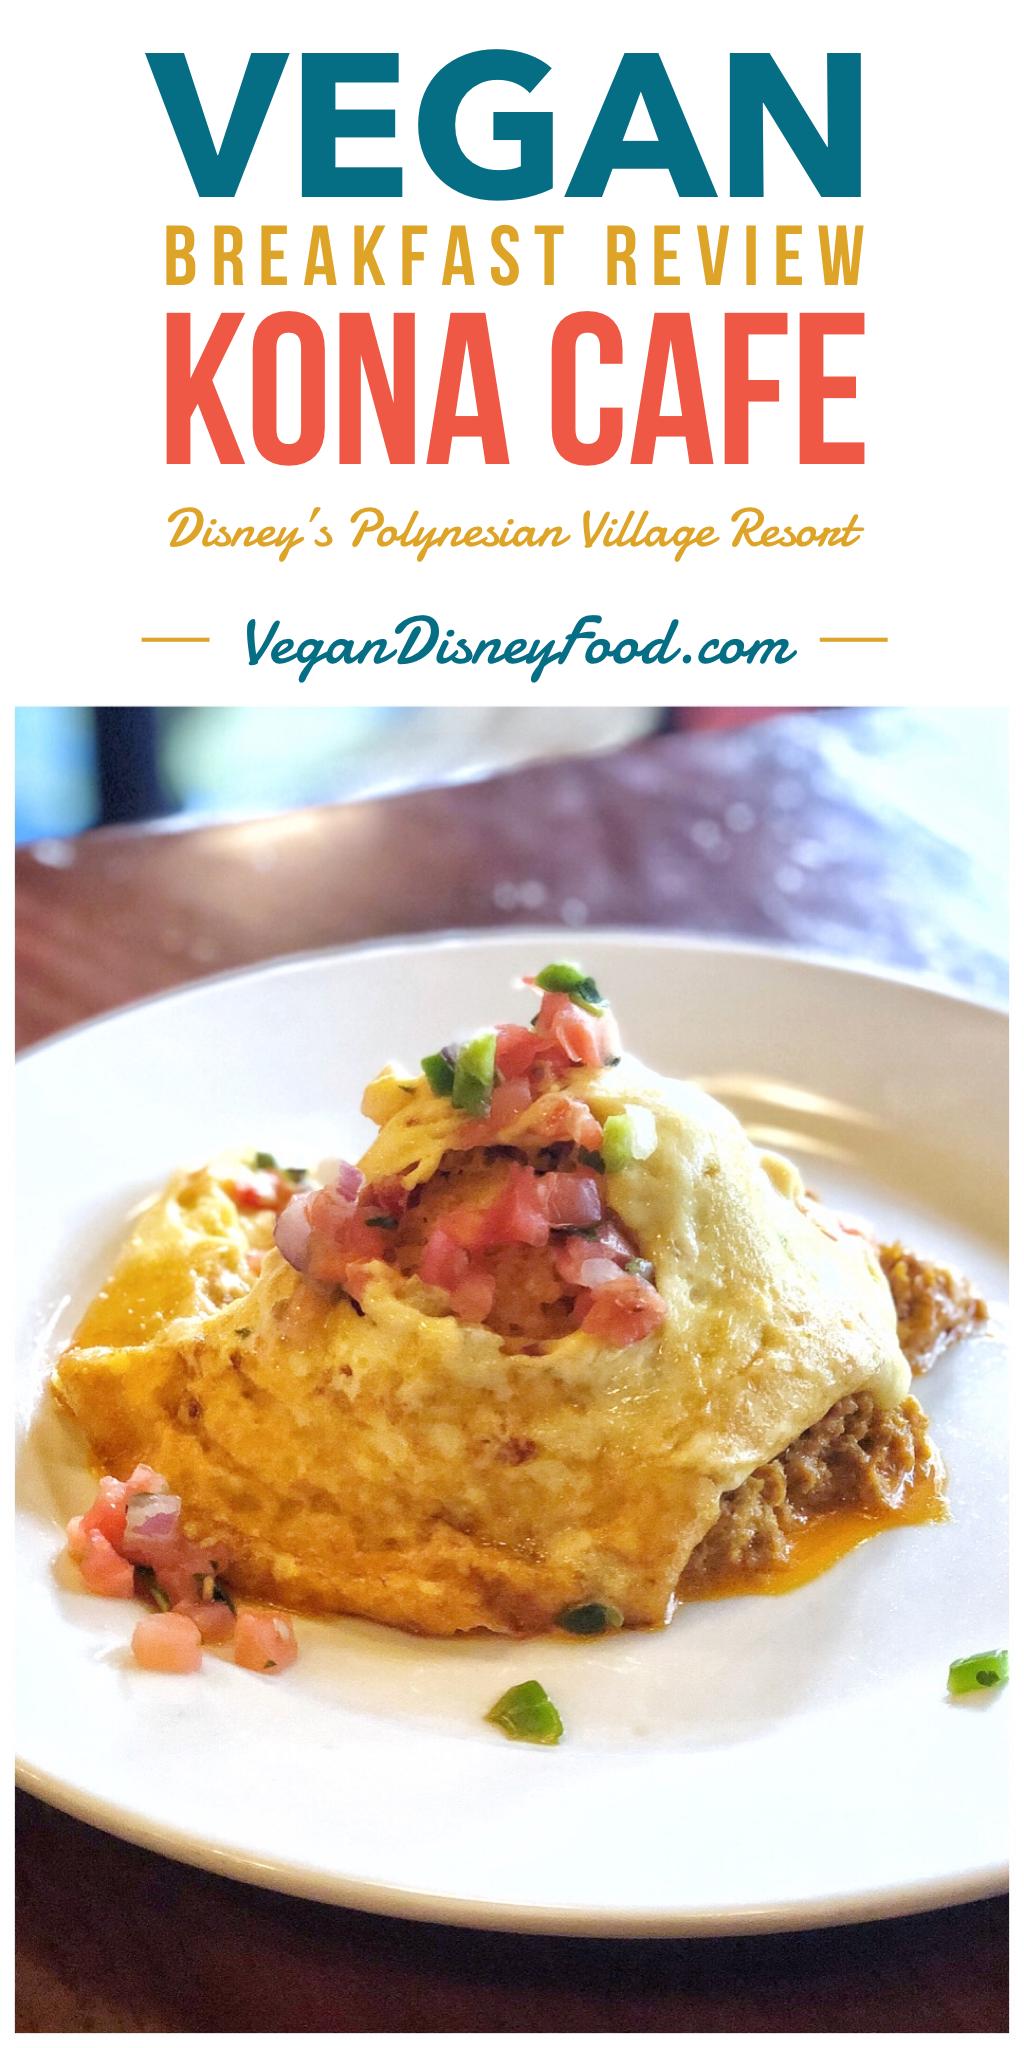 Vegan Breakfast Review At Kona Cafe In Disney S Polynesian Village Resort At Walt Disney World Kona Cafe Vegan Breakfast Loco Moco